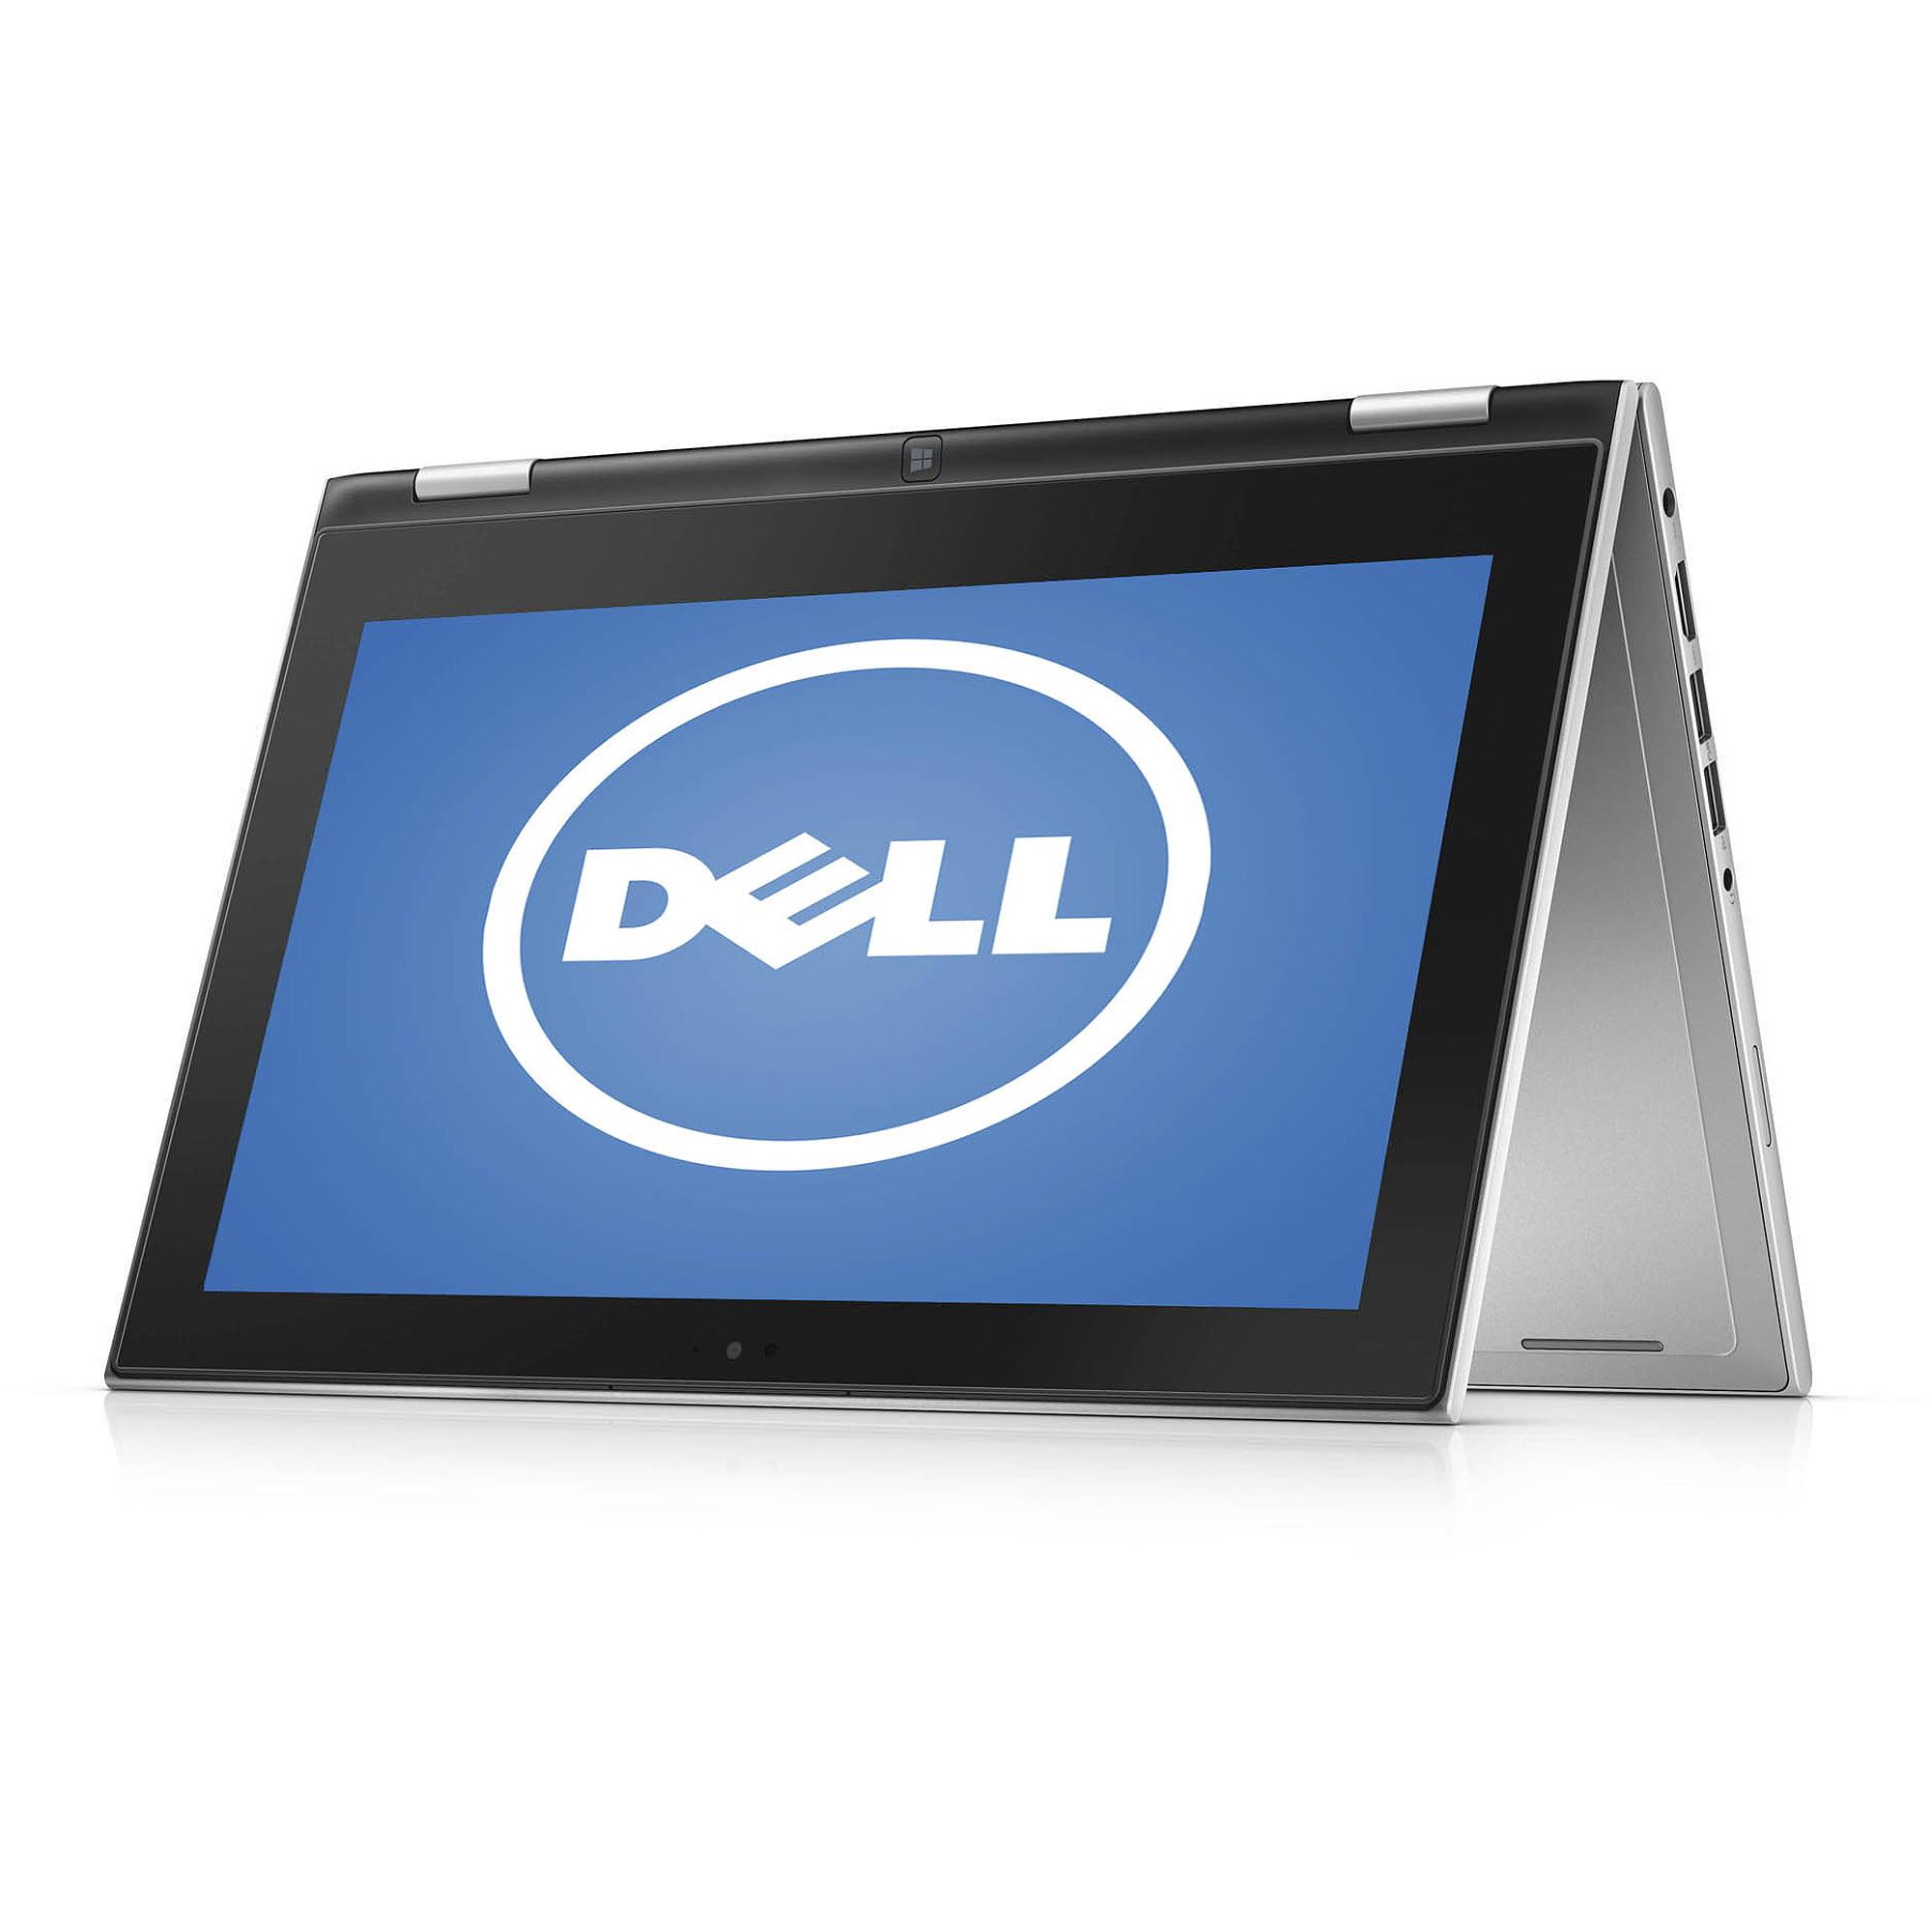 Dell Inspiron 11 3000 I3147-3750slv Convertible Laptop Pc - Intel Pentium N3530 2.16 Ghz Quad-core Processor - 4 Gb Ddr3 Sdram - 500 Gb Hard Drive - 11.6-inch Touchscreen Display - Windows 8...